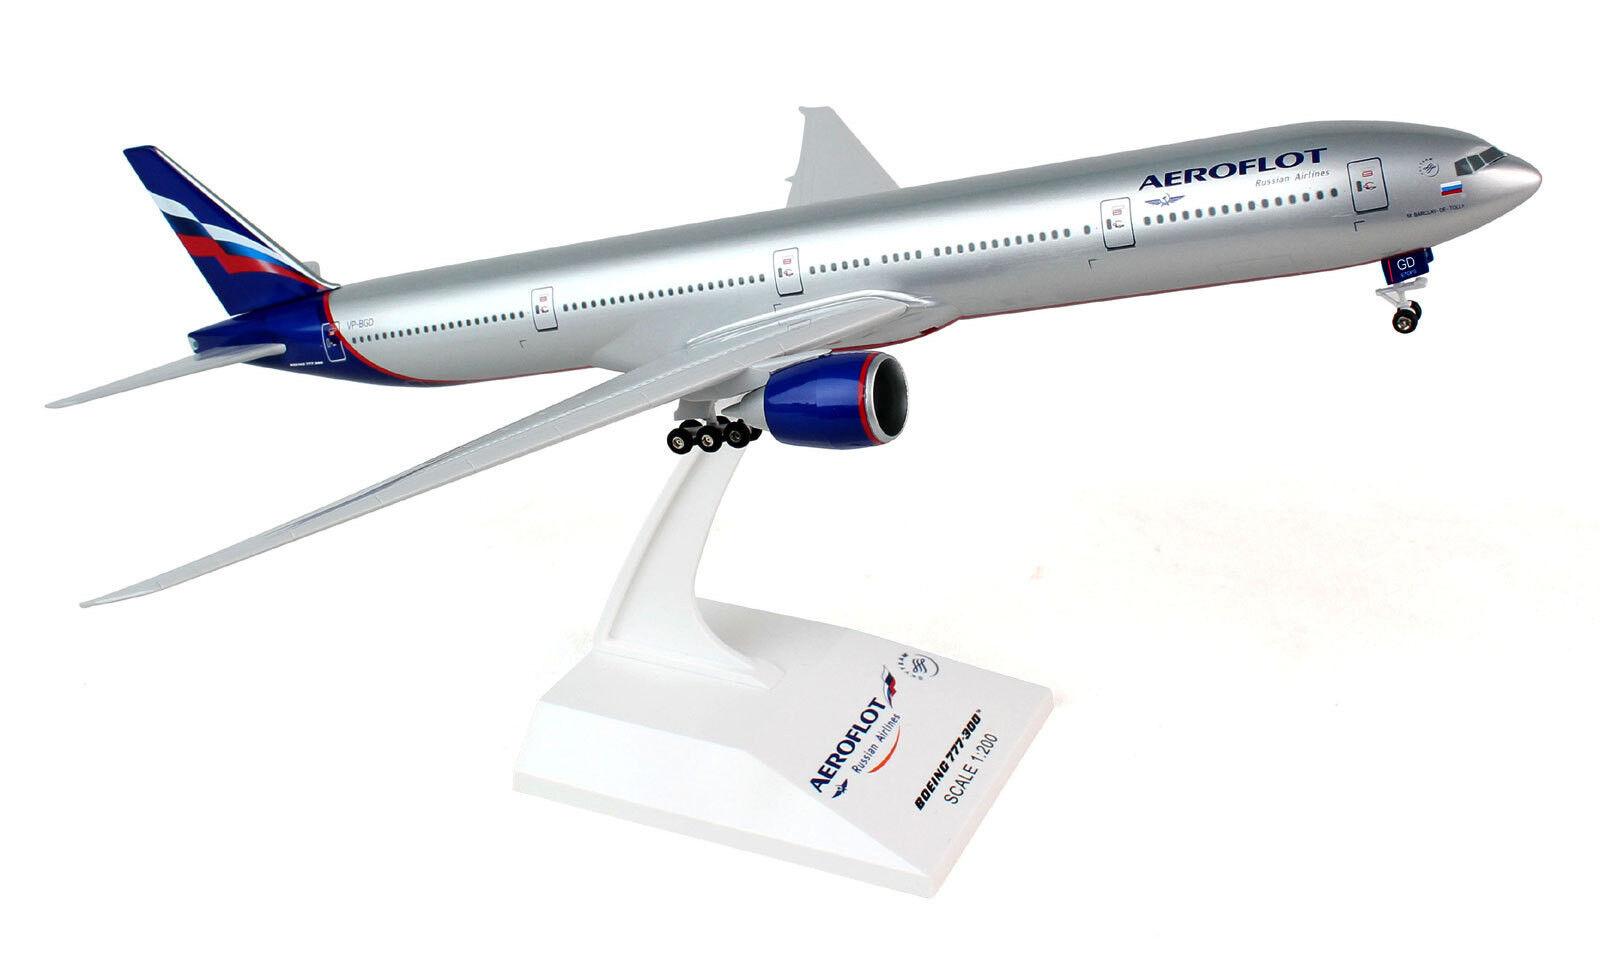 Aeroflot BOEING 777-300 1 200 skymarks aereo modello b777 skr807 b777